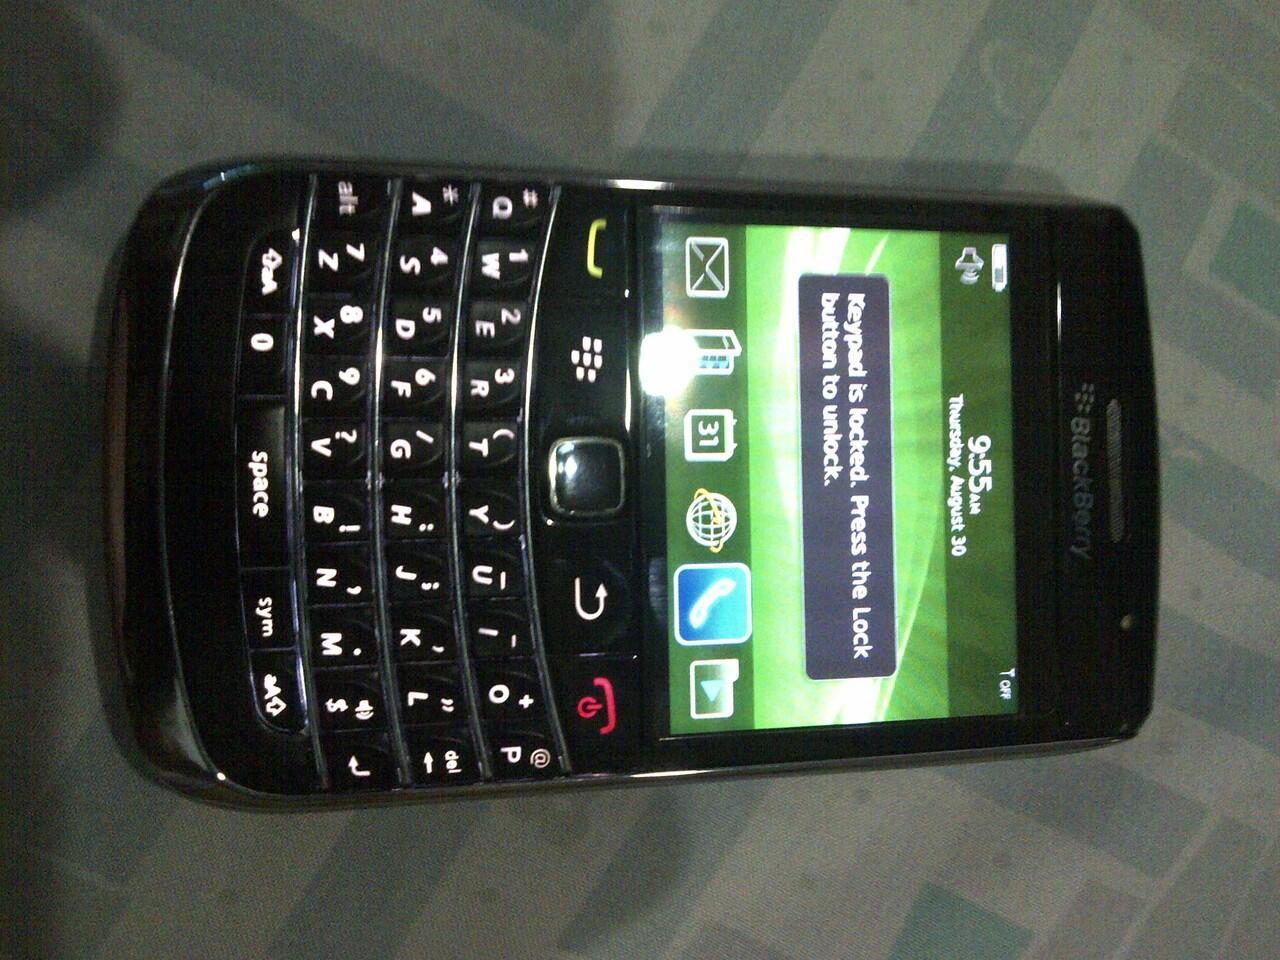 blackberry onyx1 9700 fullset black murah surabaya